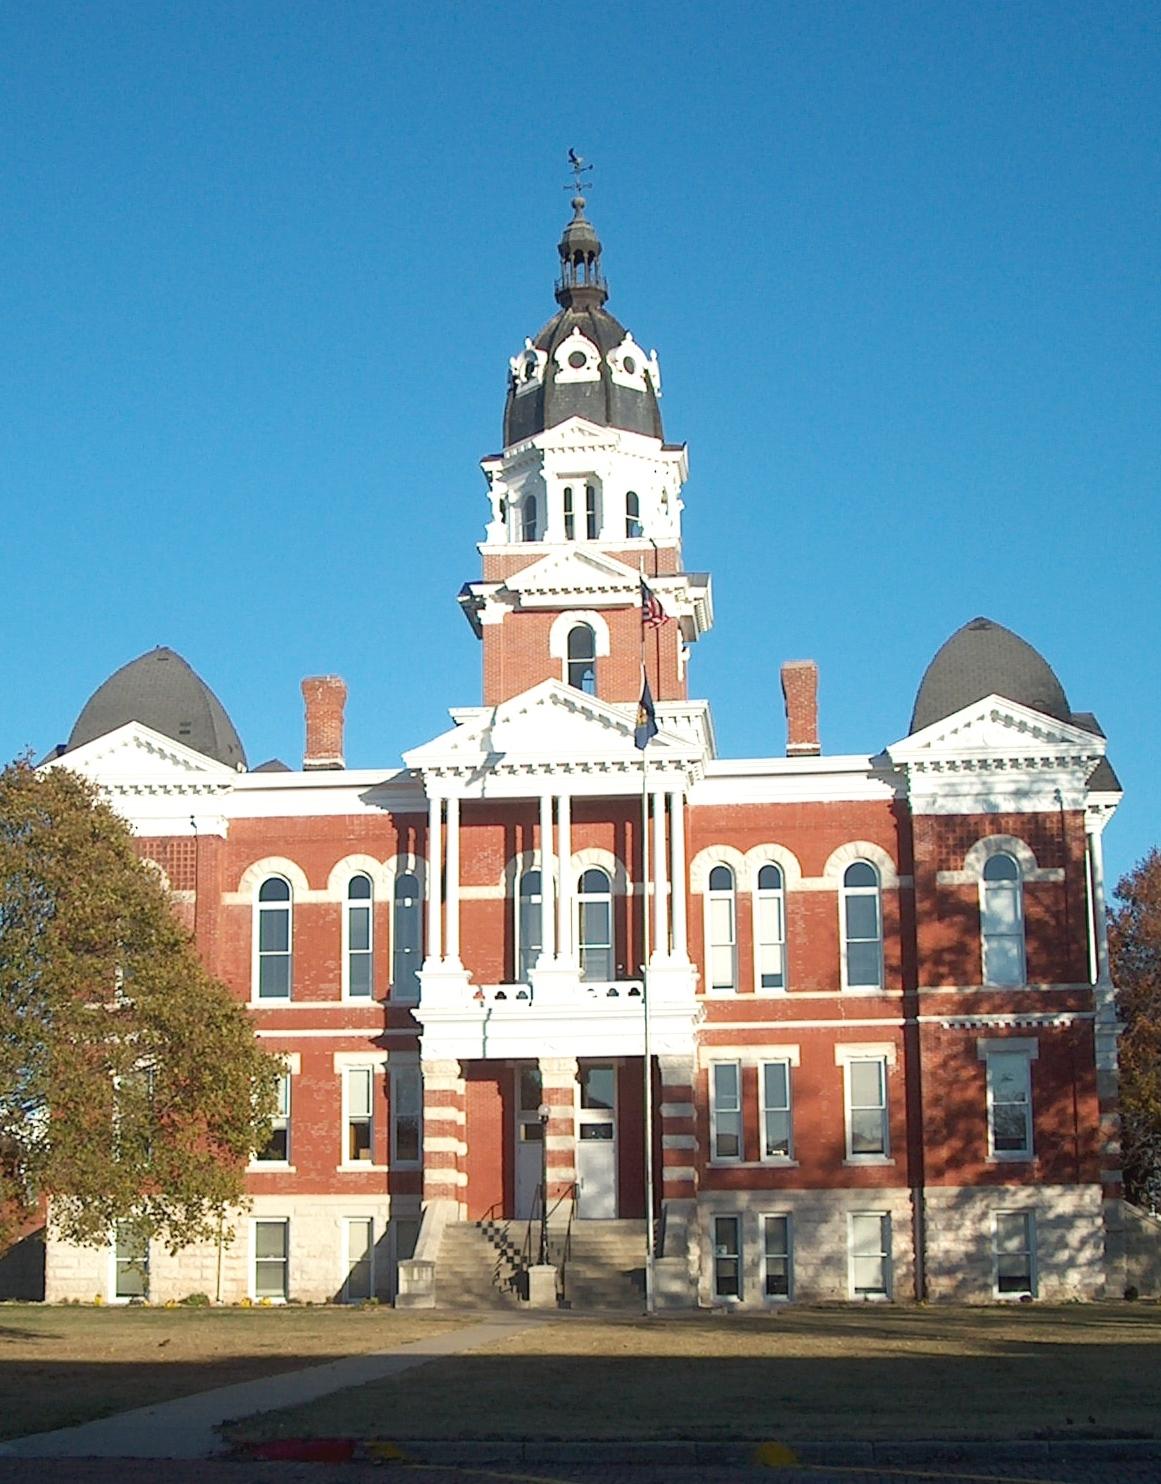 Johnson County Courthouse, Tecumseh, Nebra